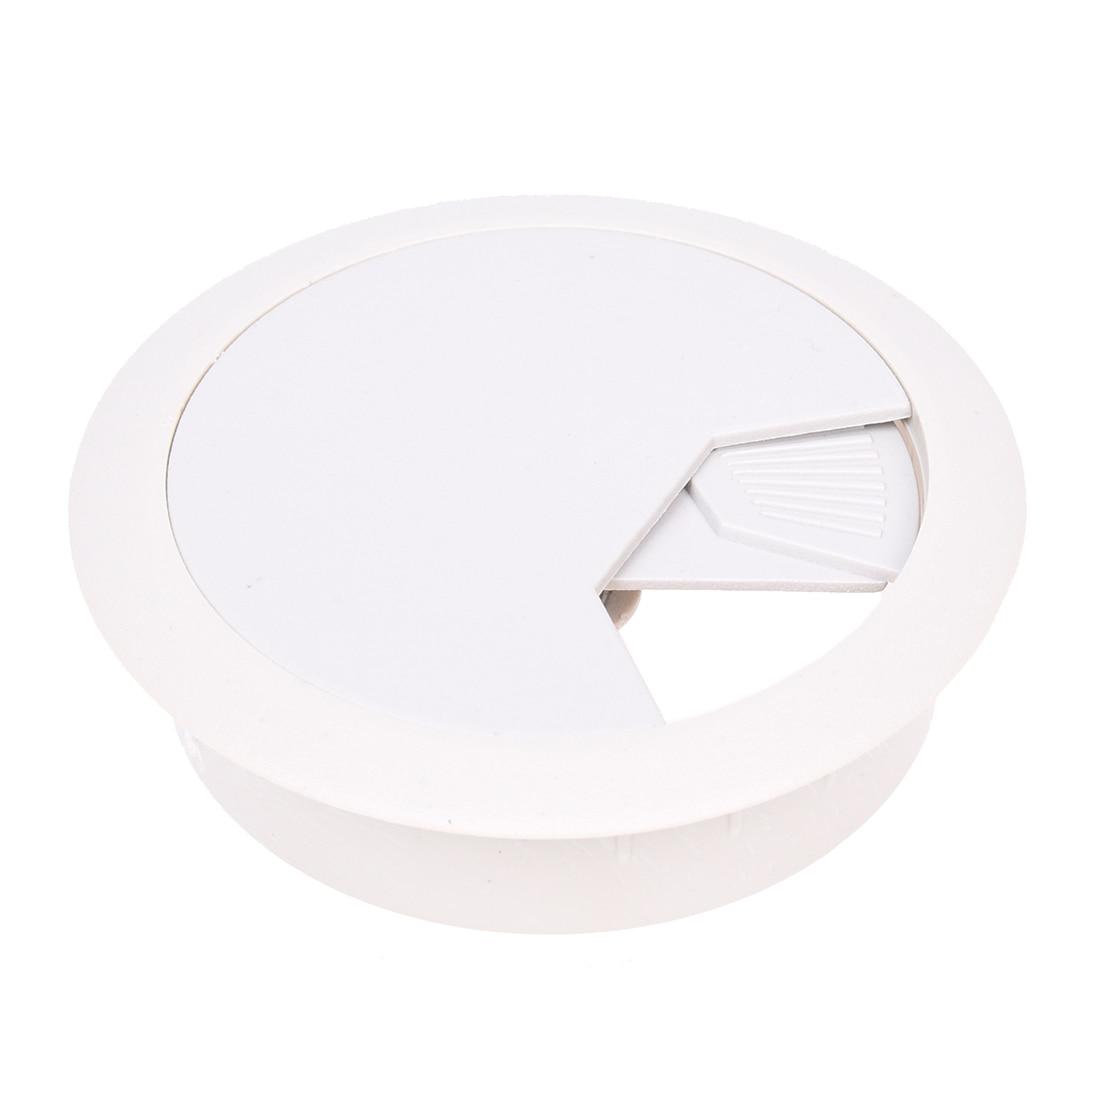 HOT GCZW-PC Desk Gray Plastic 50mm Diameter Grommet Cable Hole Cover 10 Pcs legare straight desk gray driftwood